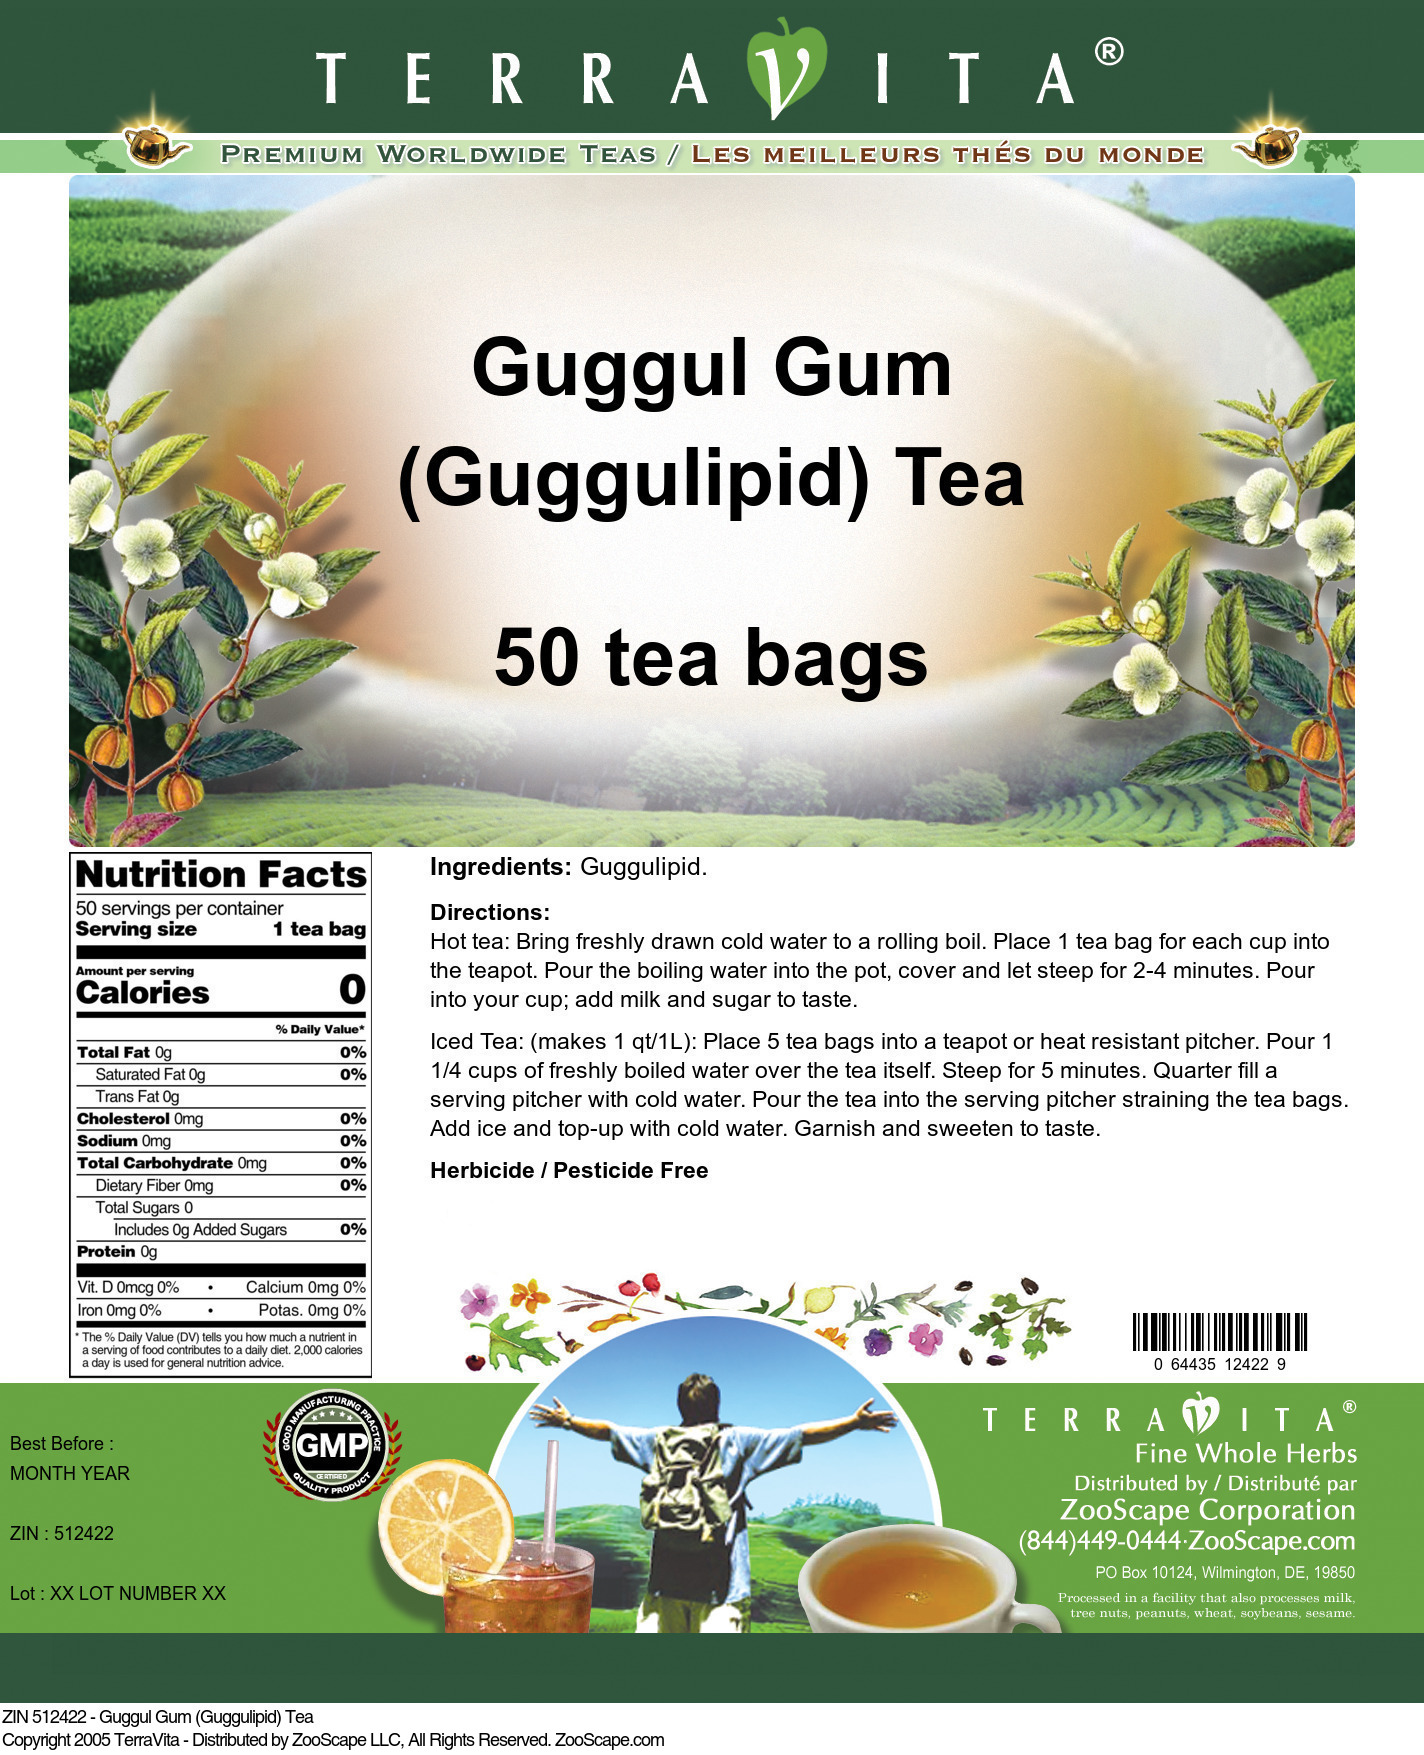 Guggul Gum (Guggulipid) Tea